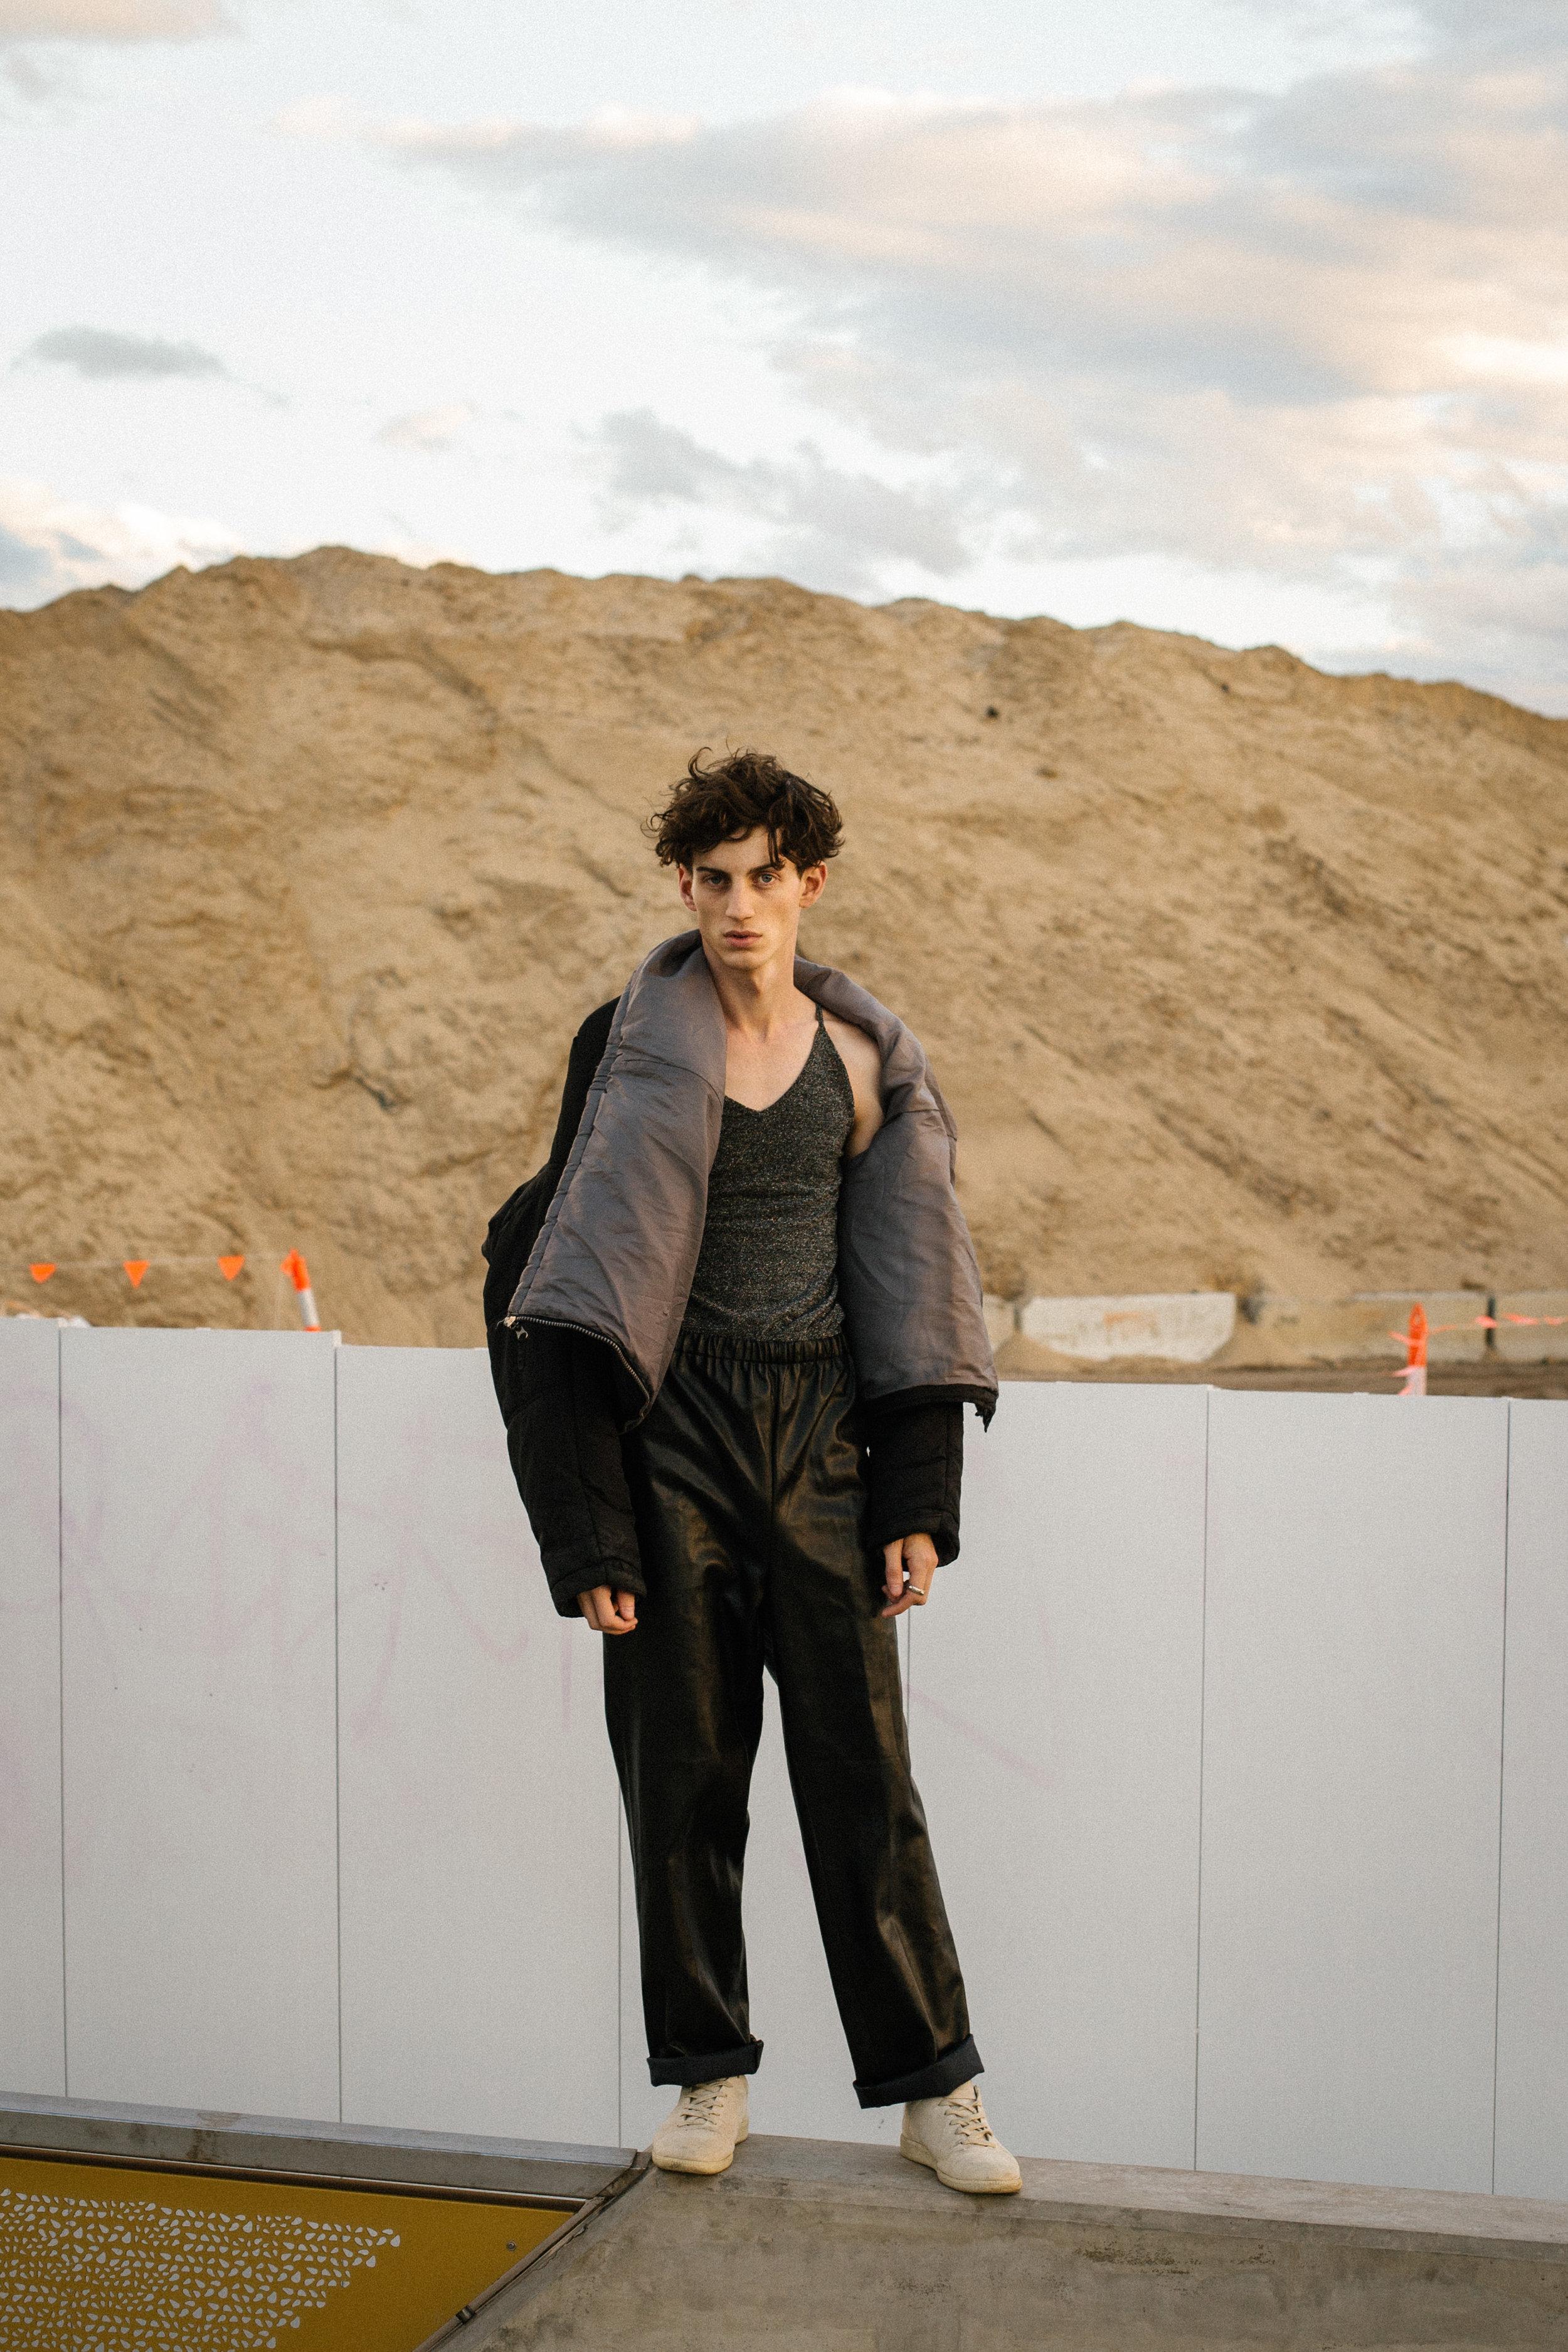 jacket Issey Miyake, singlet Stylists own, pants topshop, shoes Maison Martin Margiela